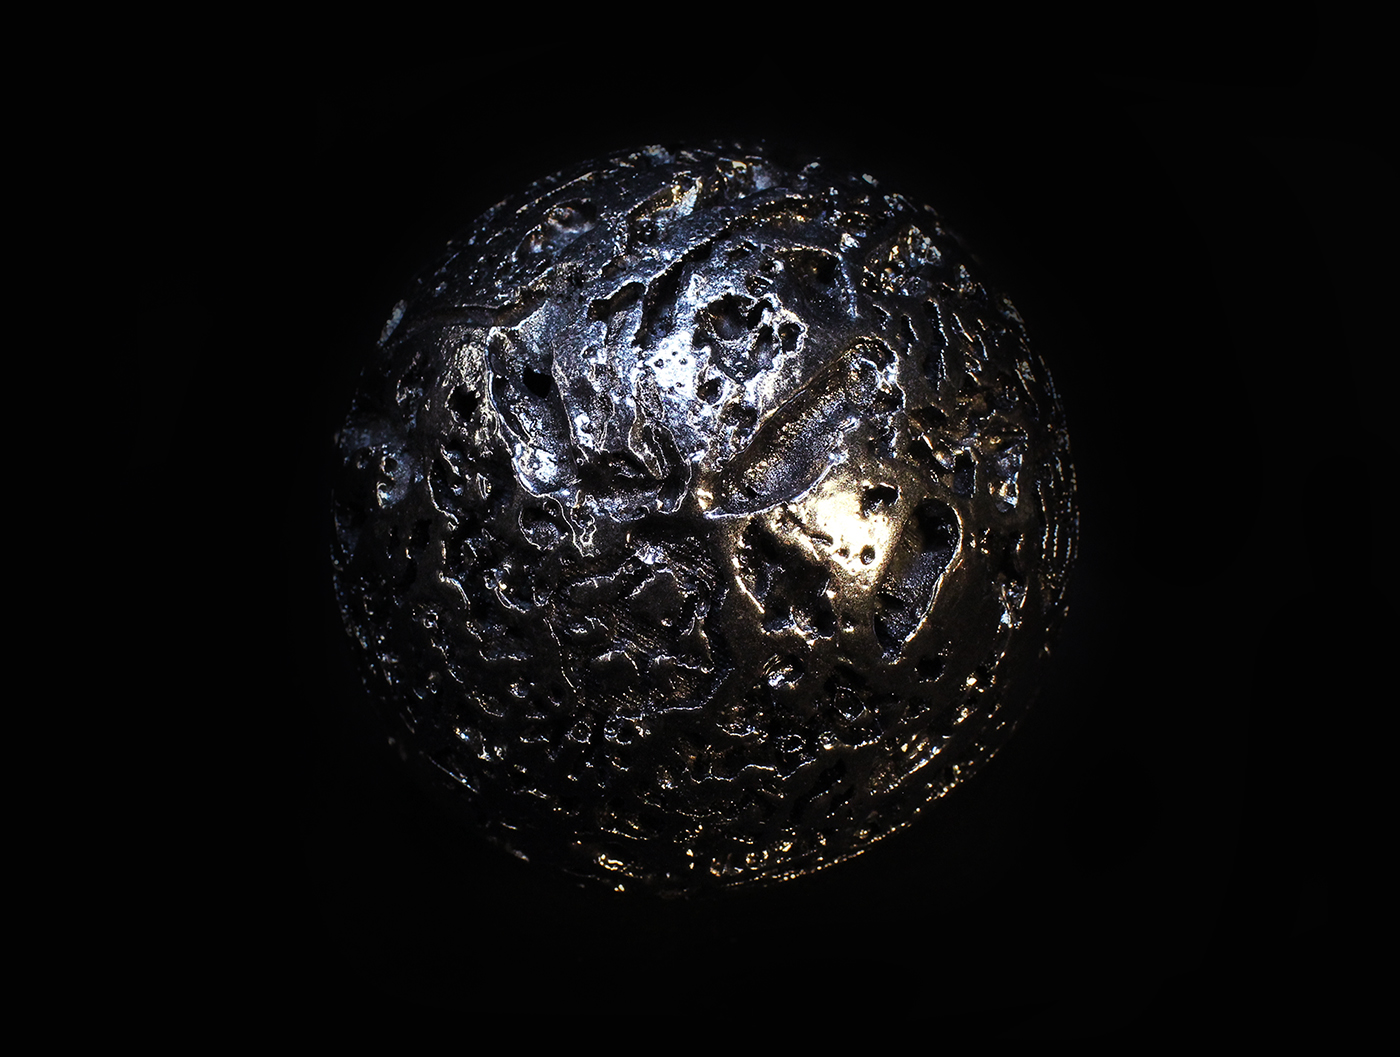 INFINITY ORB - infinity orb - Prop Replicas, Custom ...